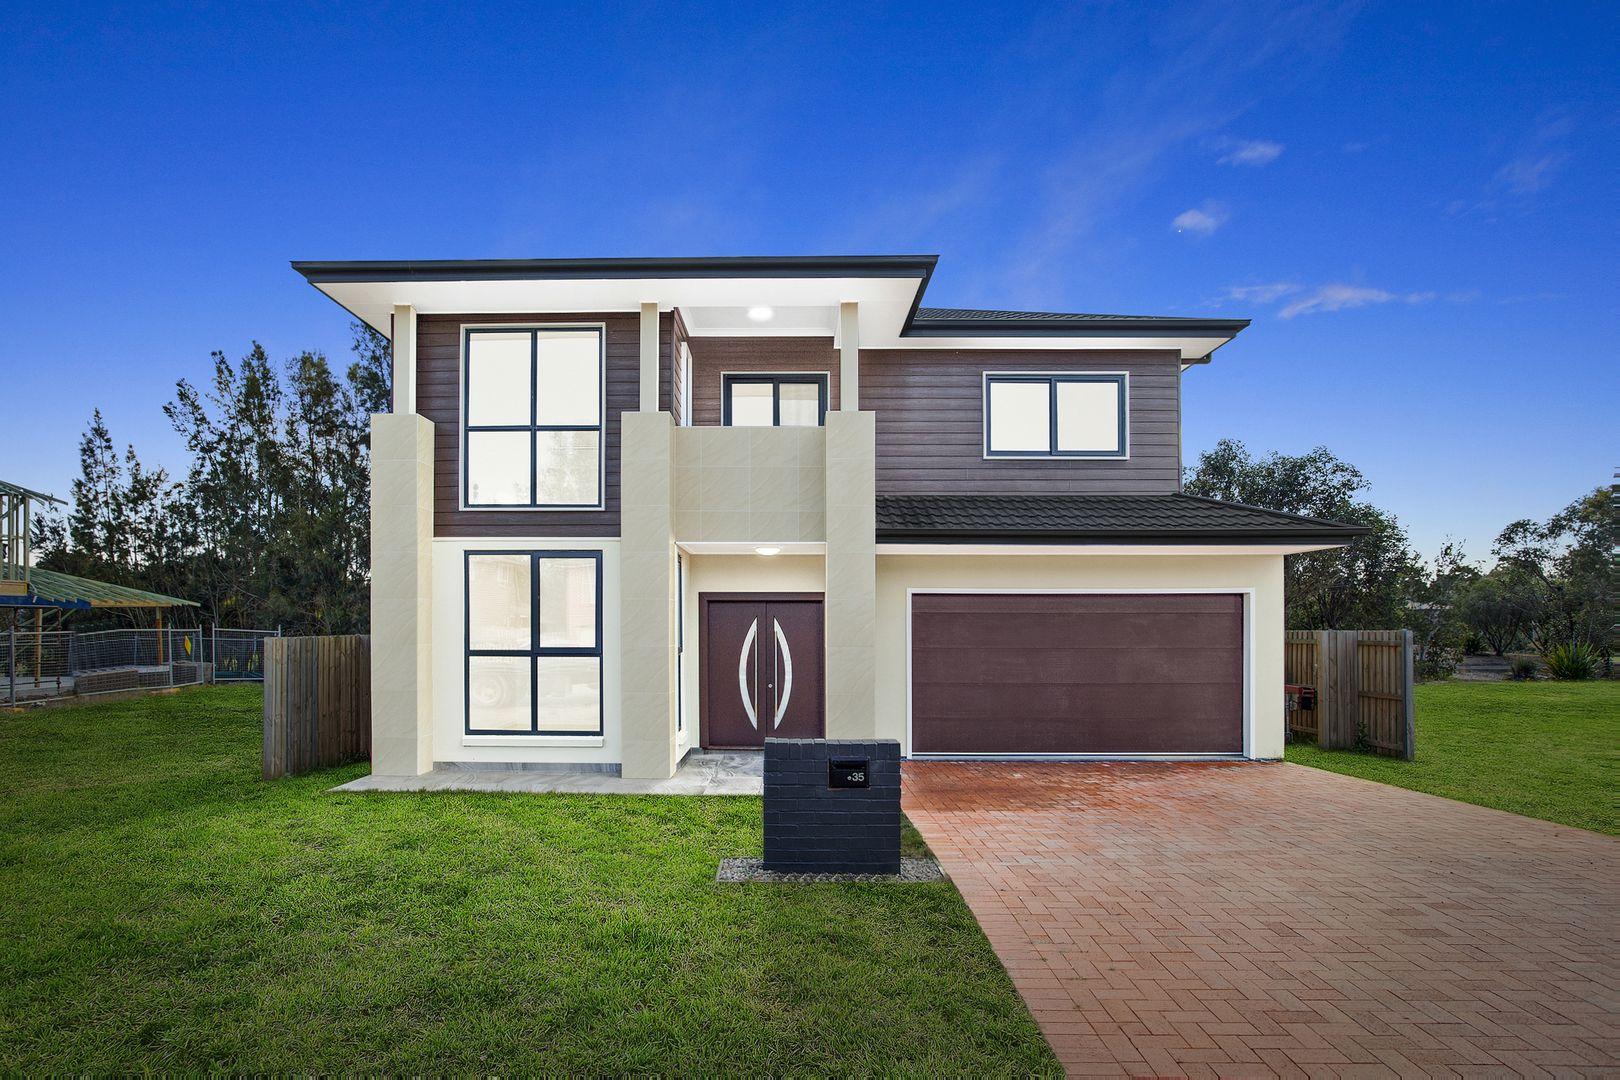 35 Windsorgreen Drive, Wyong NSW 2259, Image 0